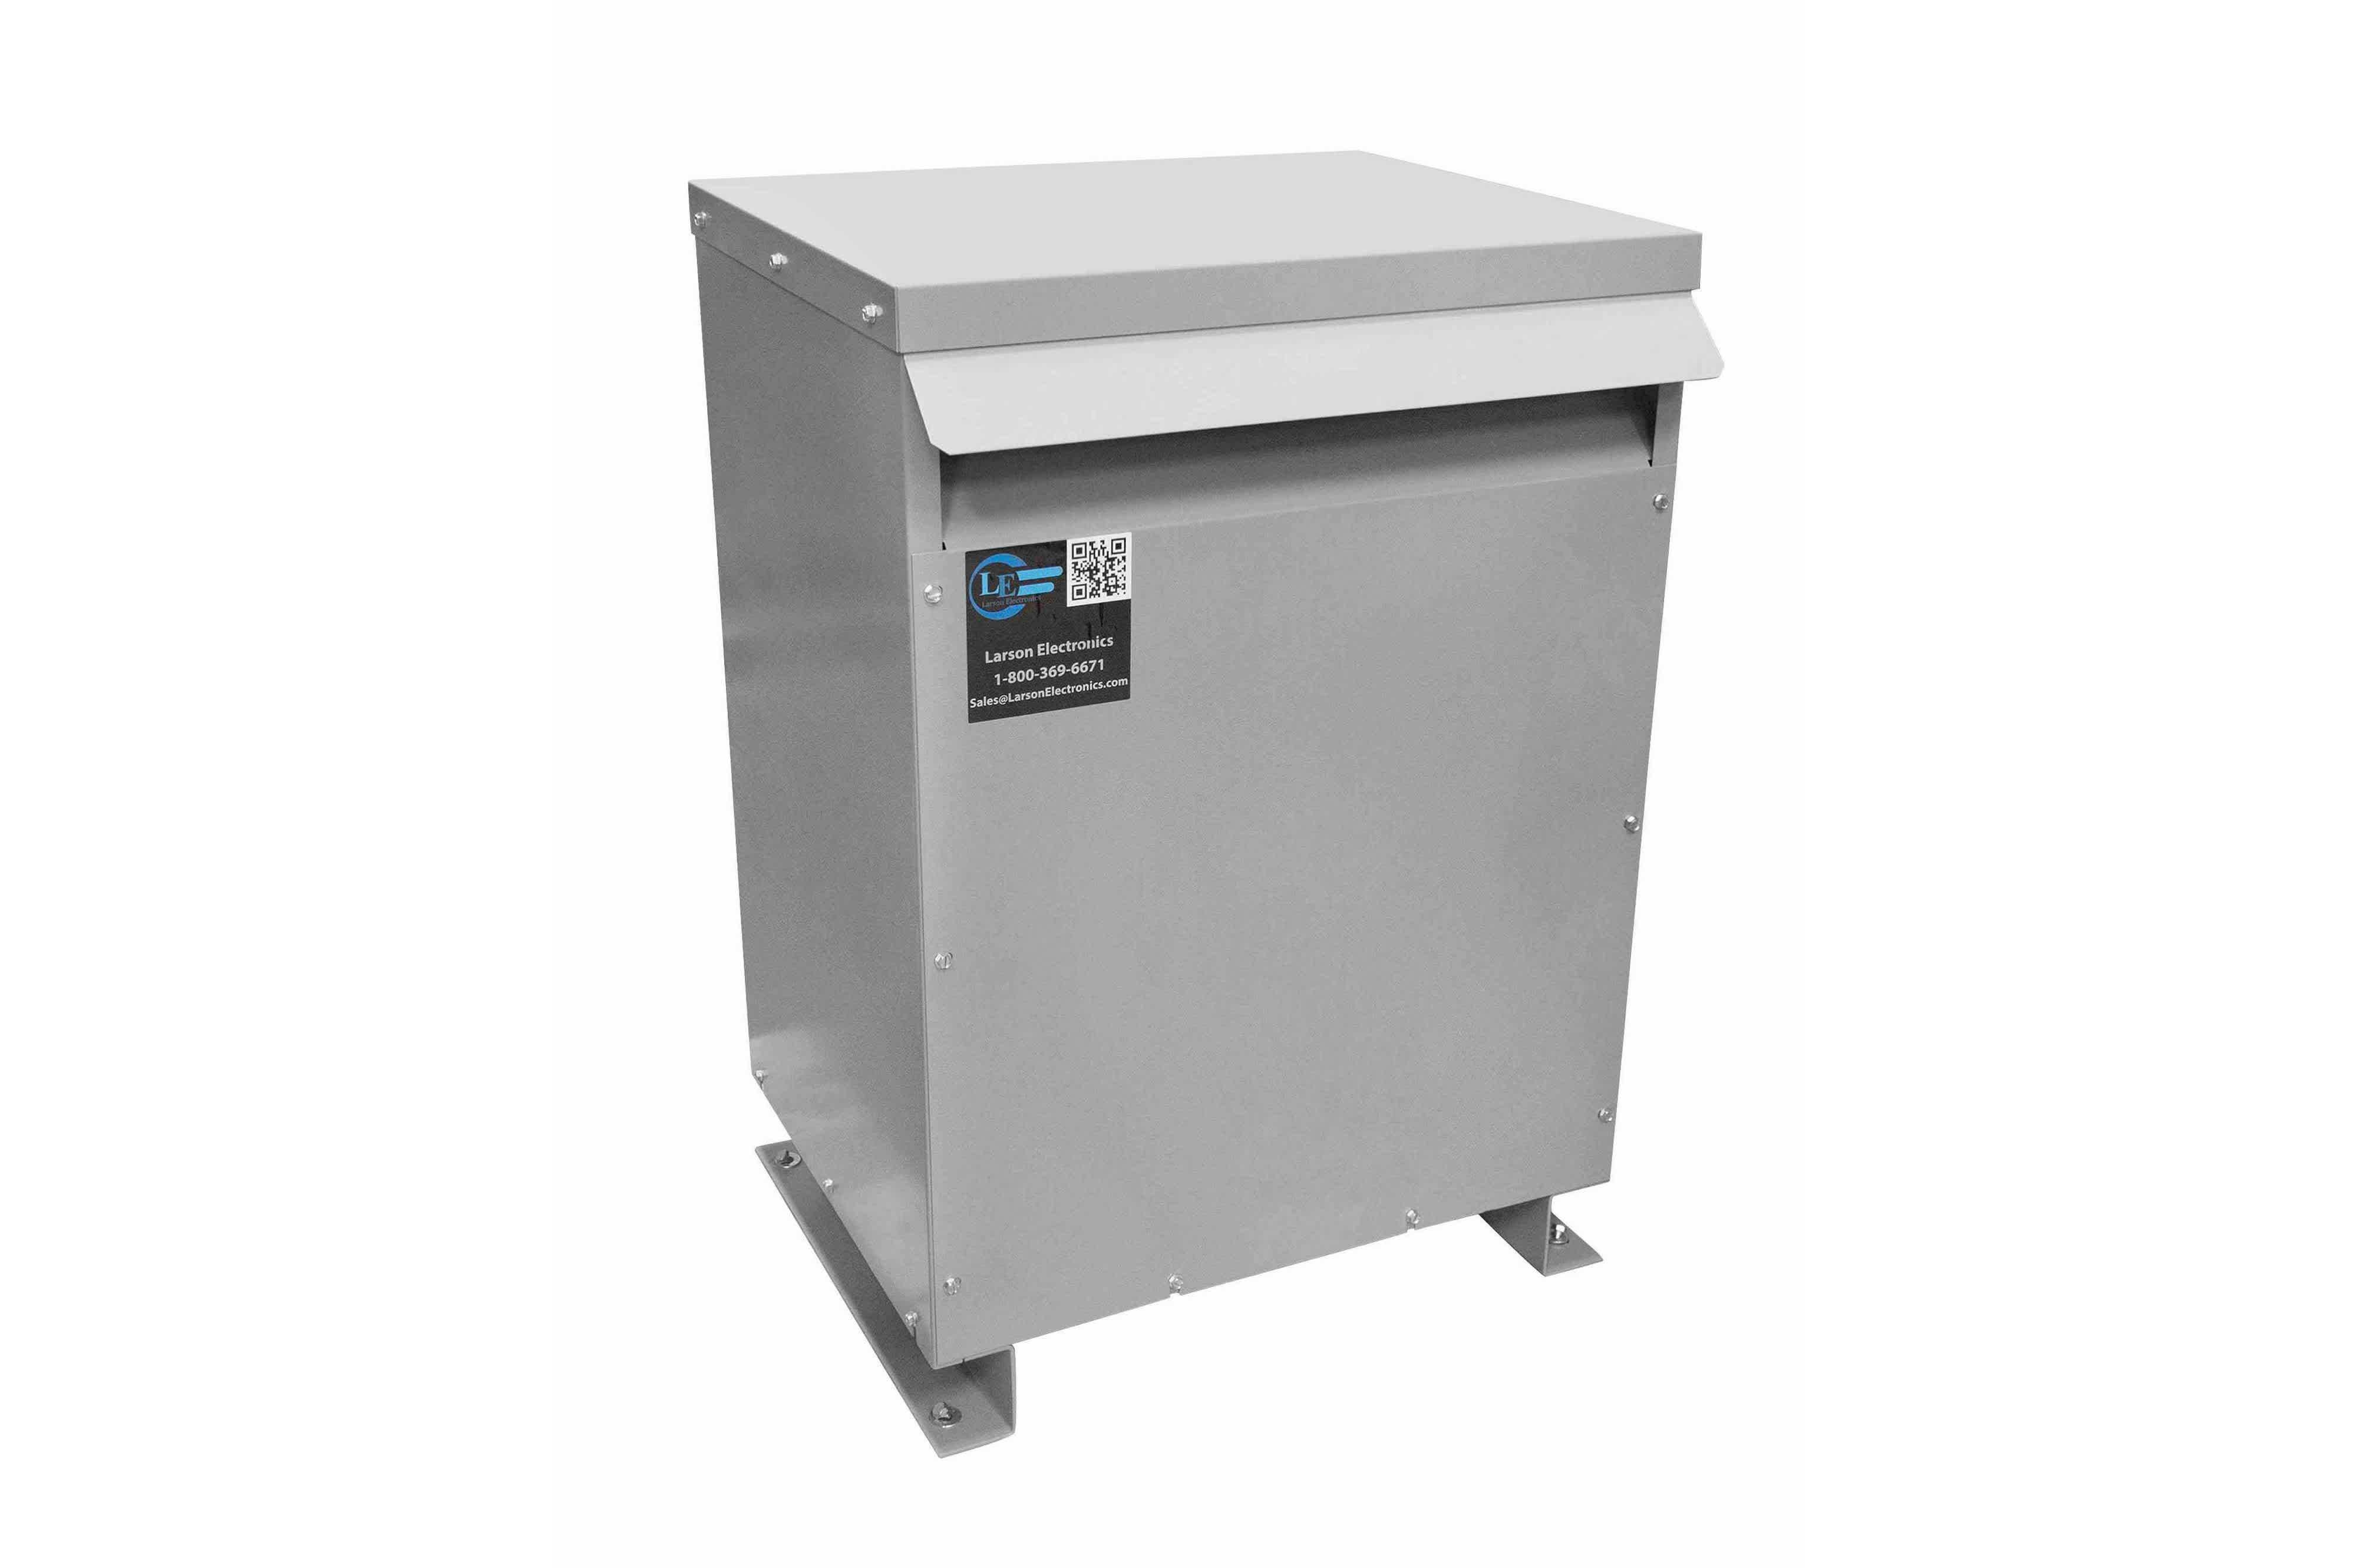 275 kVA 3PH Isolation Transformer, 240V Wye Primary, 400Y/231 Wye-N Secondary, N3R, Ventilated, 60 Hz